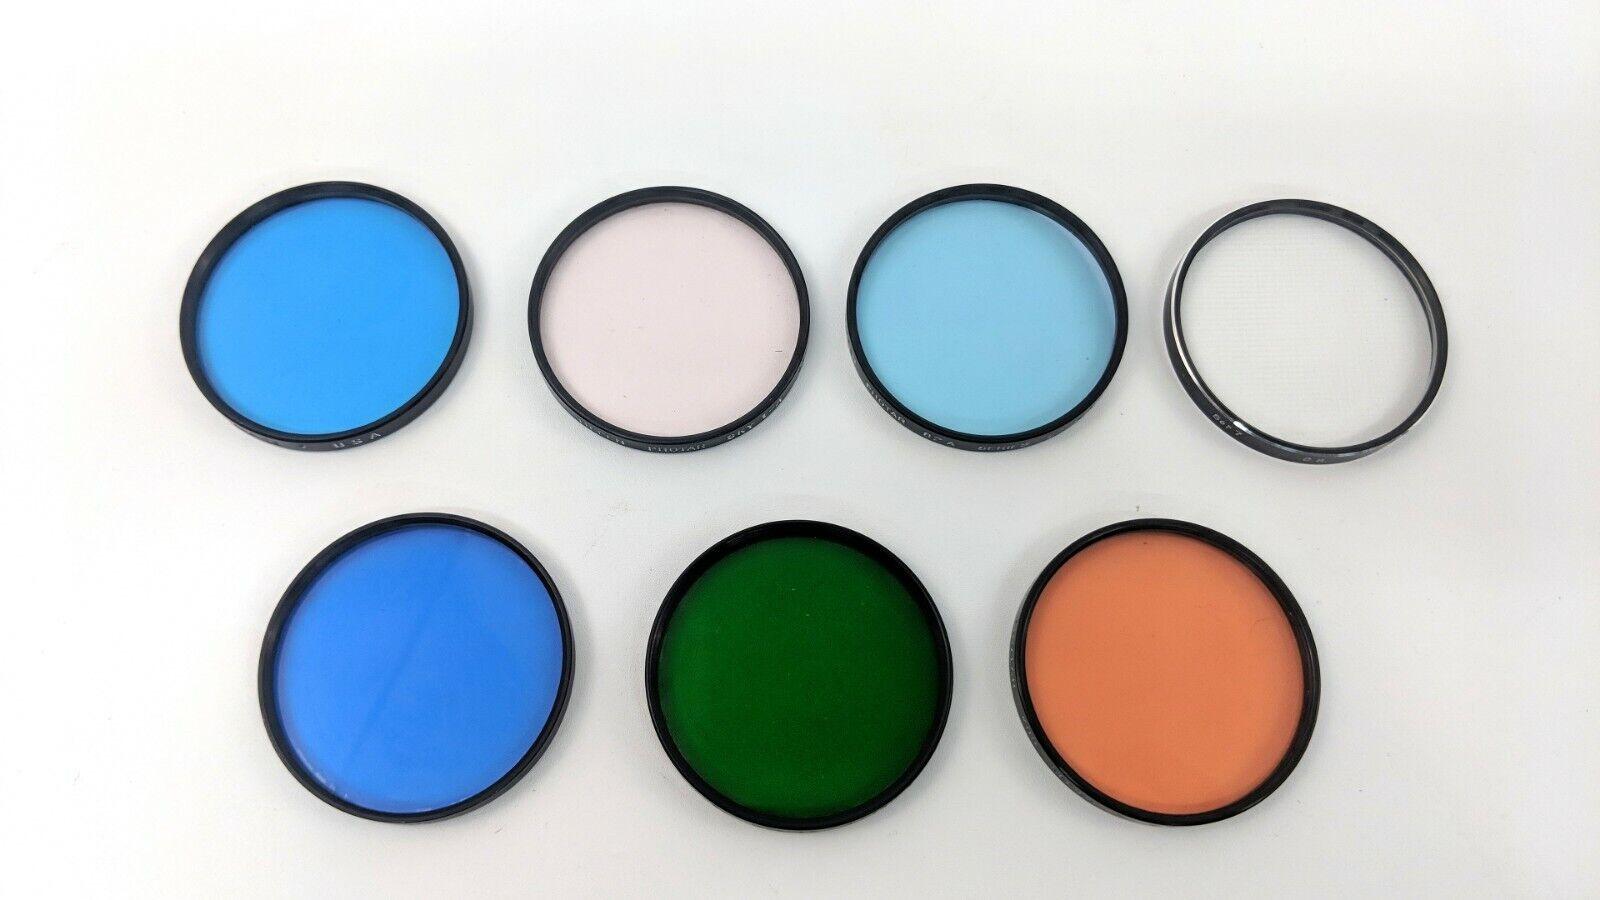 Lot of 7 Vintage Tiffen Photar Series 7 Drop In Filter Set 80C,82,Sky1-A,Green 1